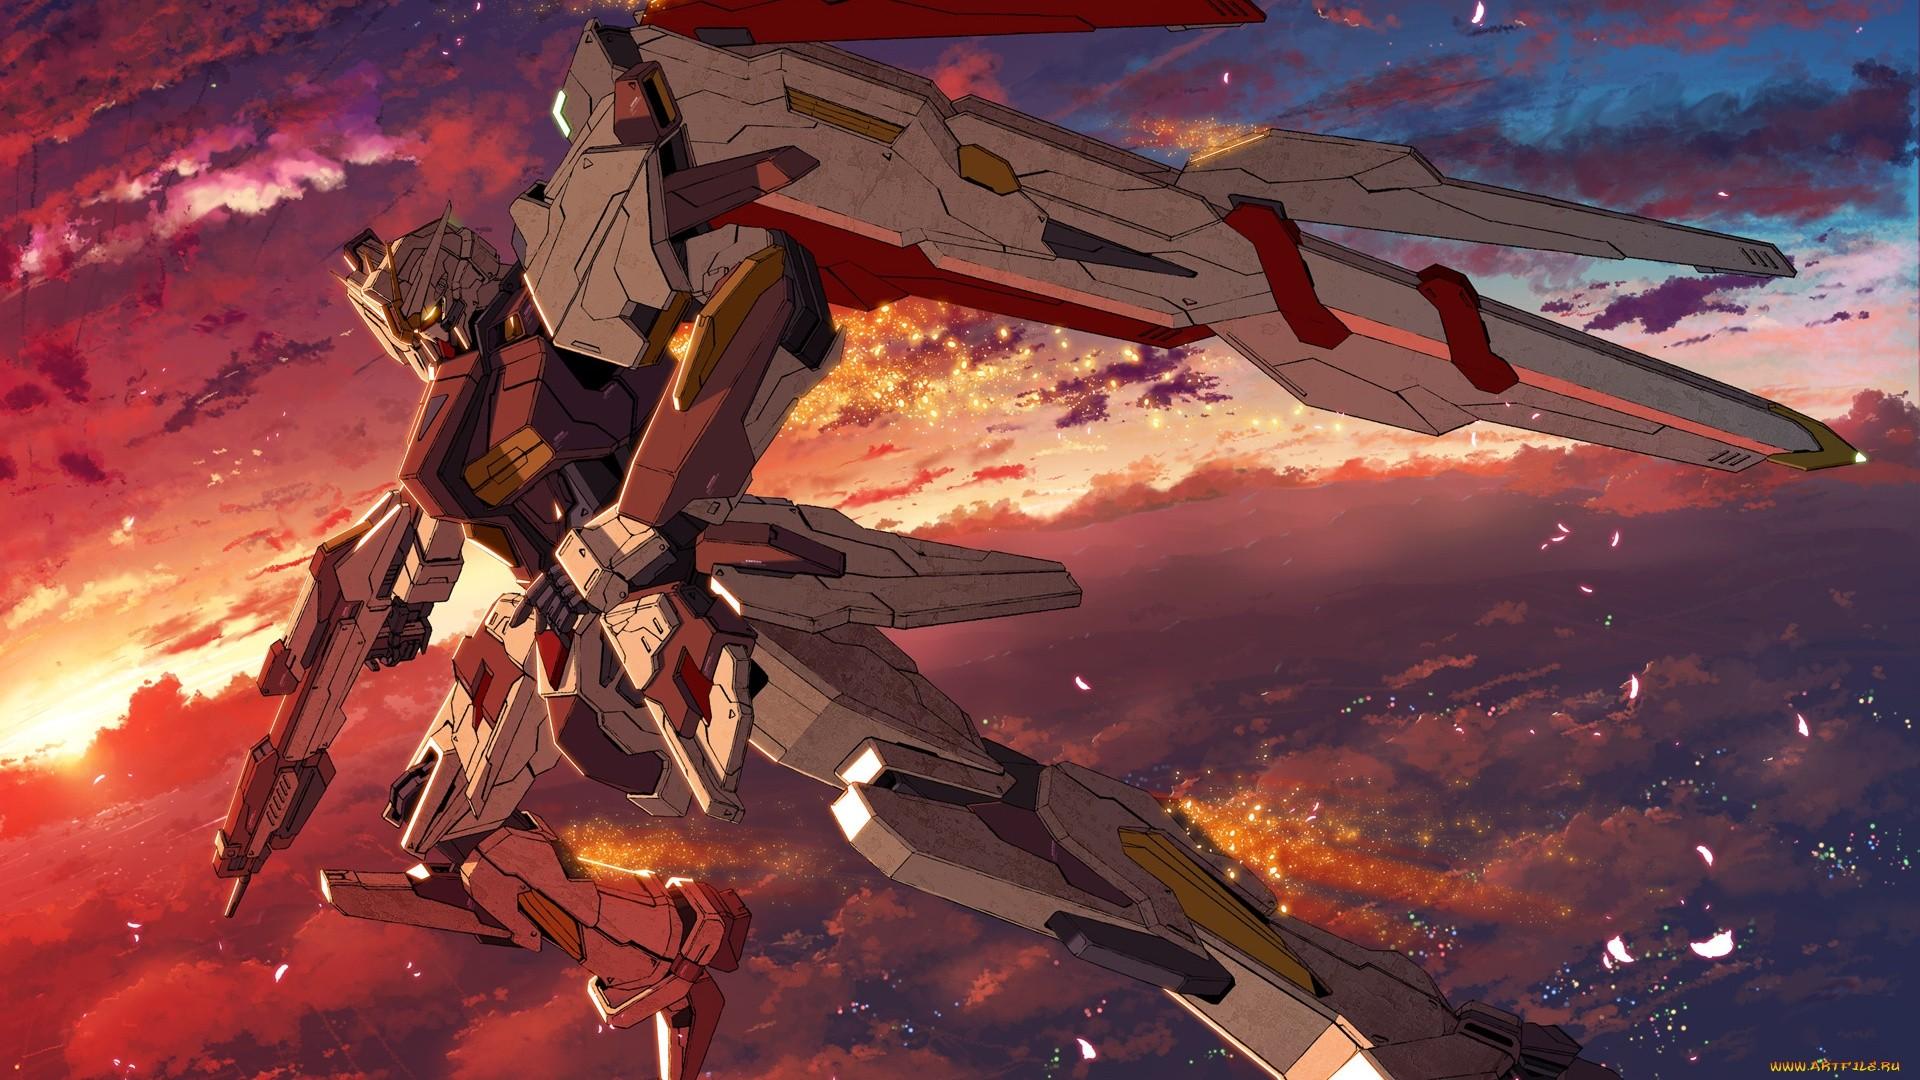 Gundam Wallpaper Pic